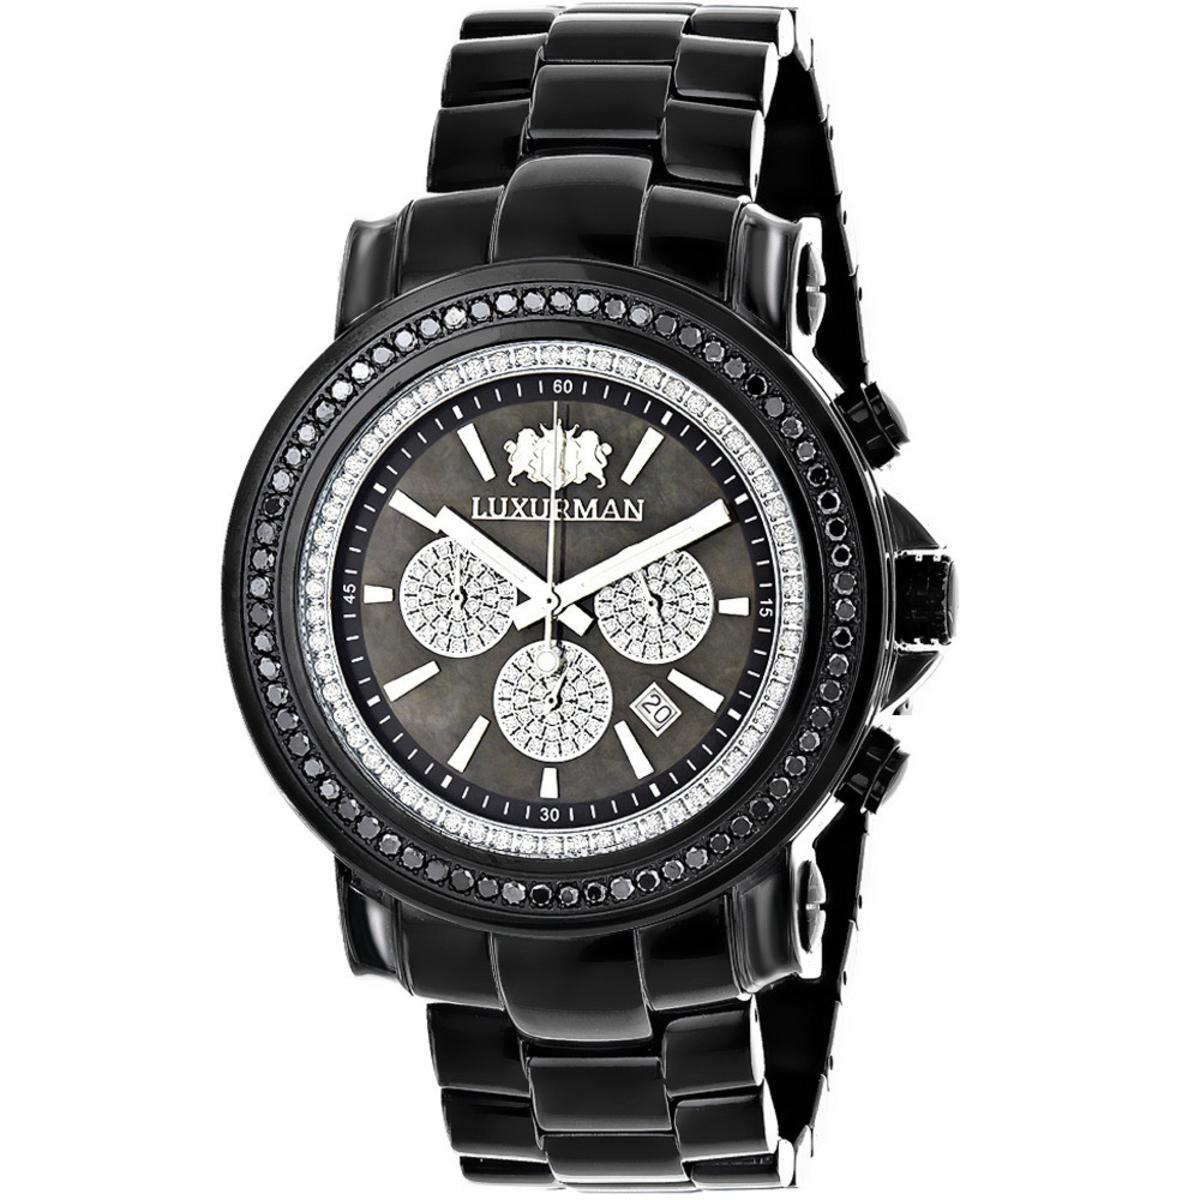 Oversized Mens Black Diamond Watch by Luxurman 3ct Chronograph Escalade